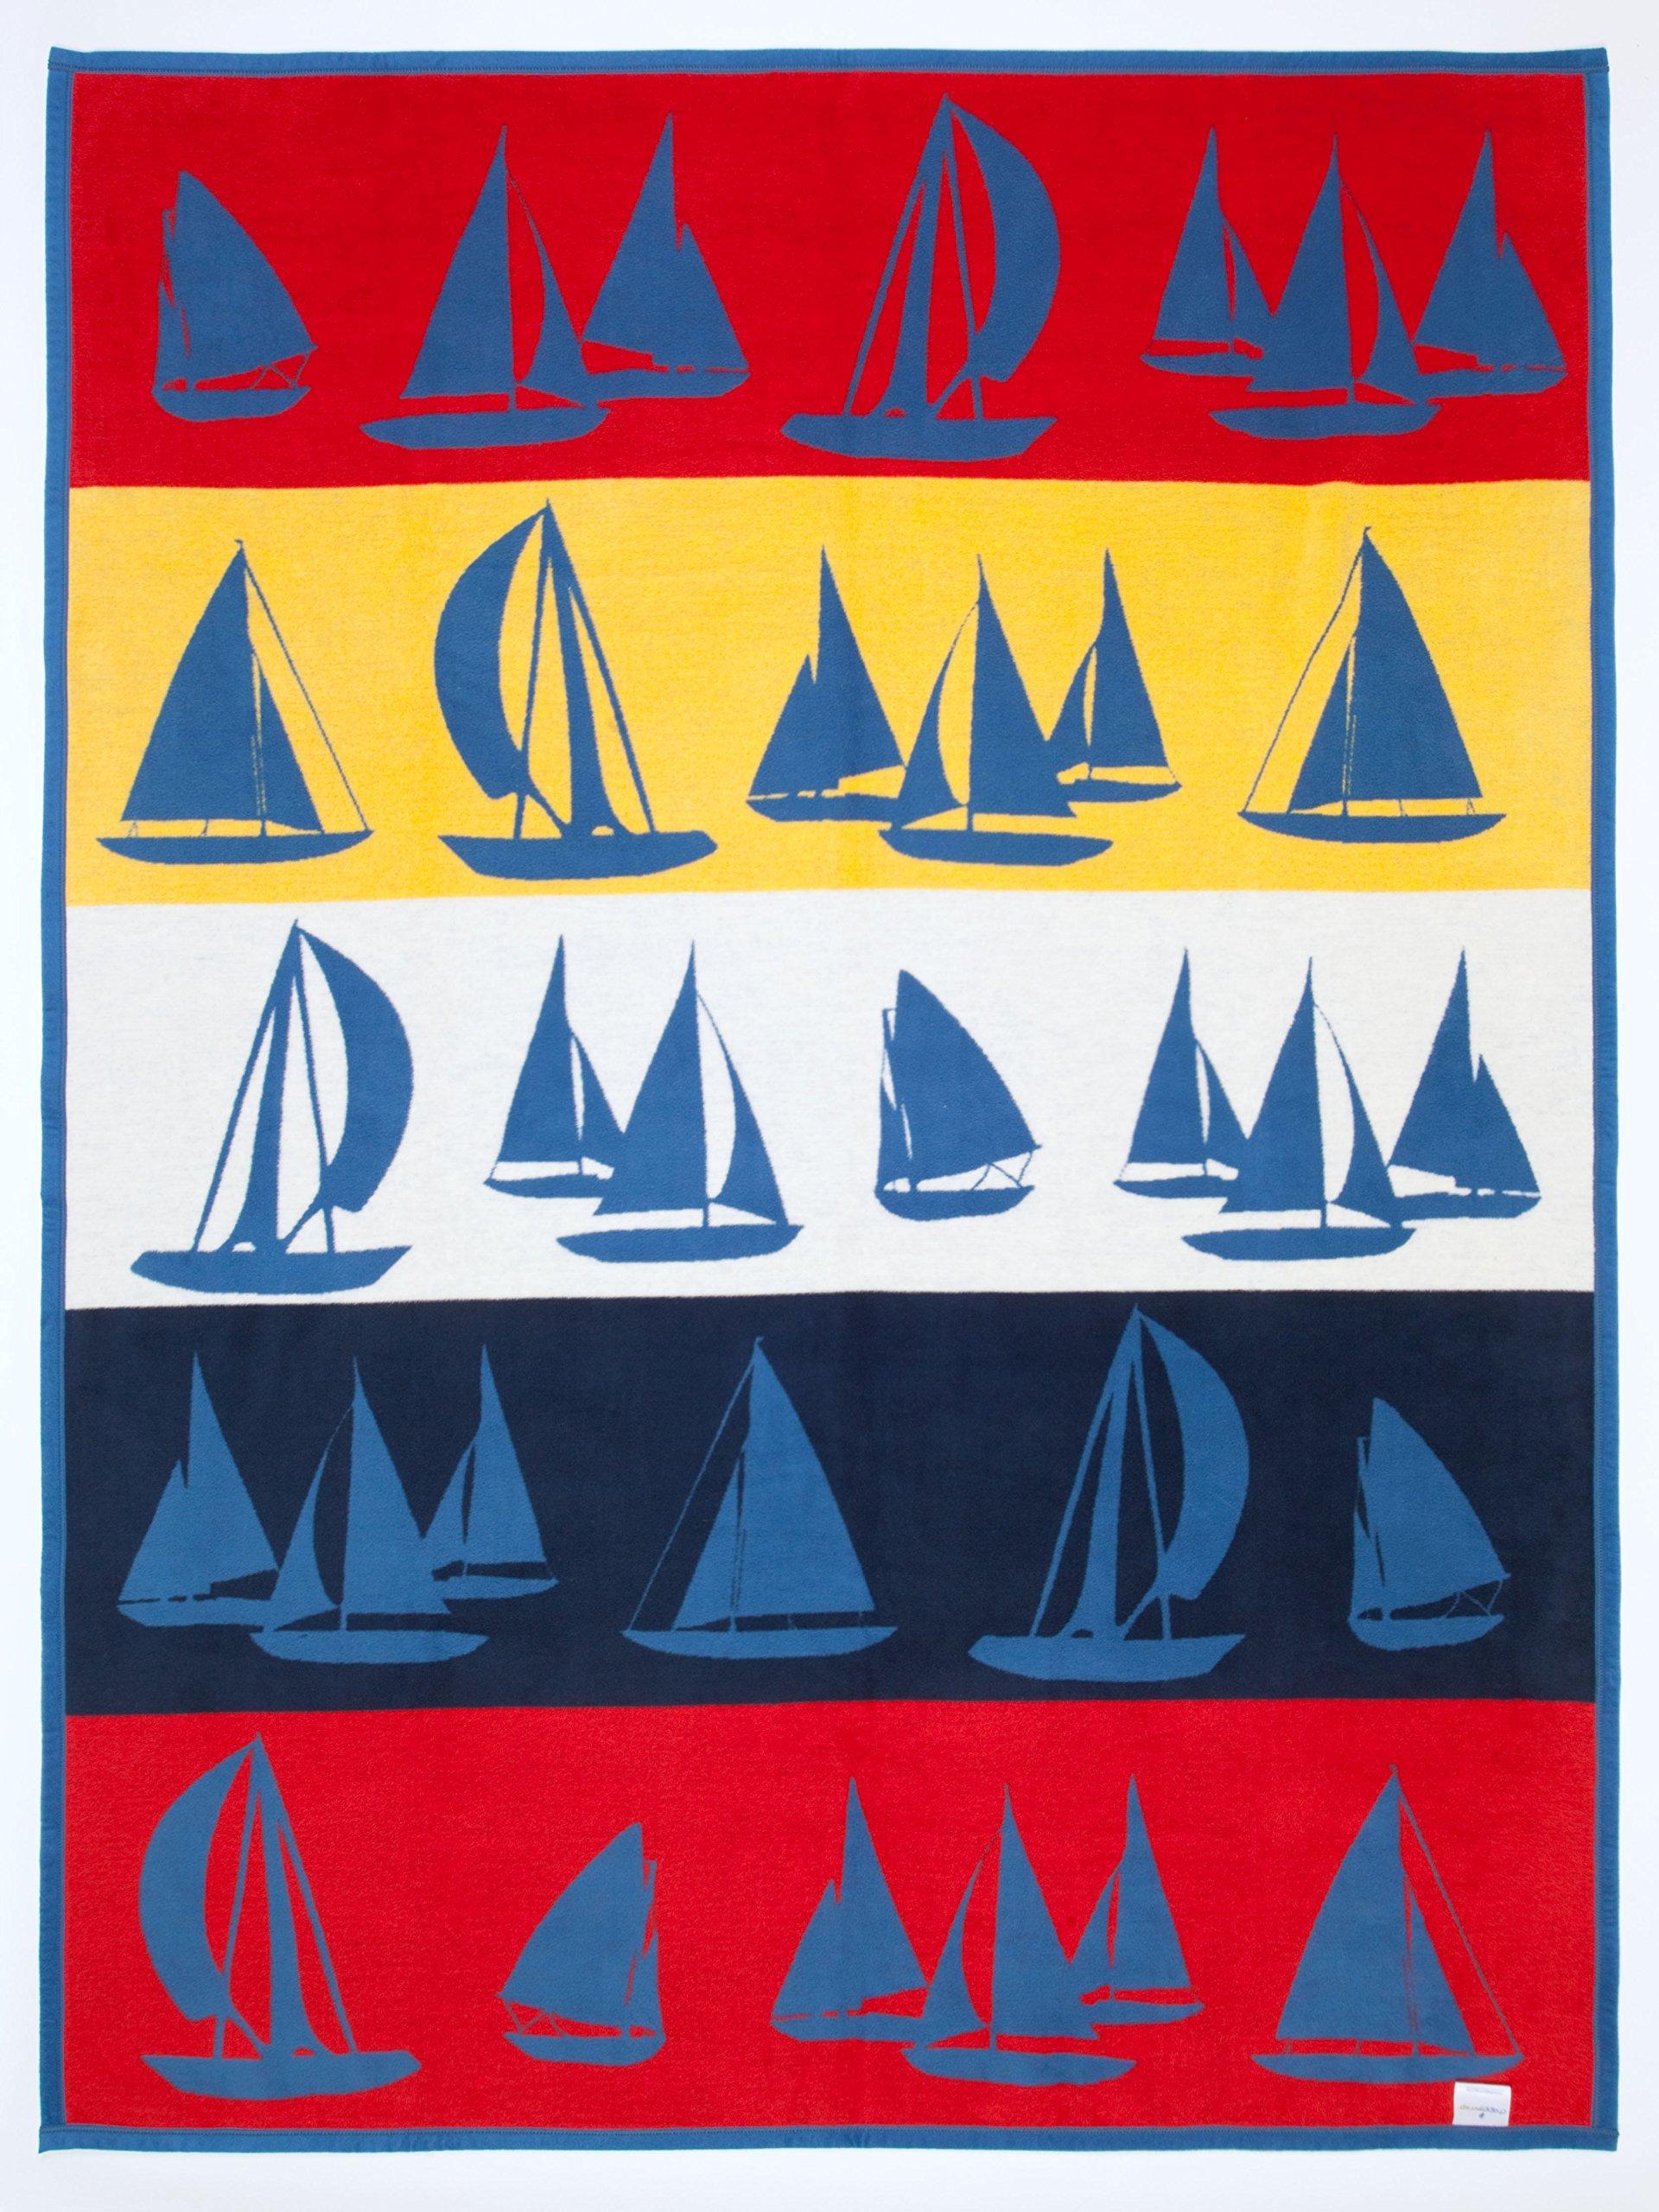 ChappyWrap Oversize Cotton Throw Blanket - Coastal Living Collection by ChappyWrap (Image #7)